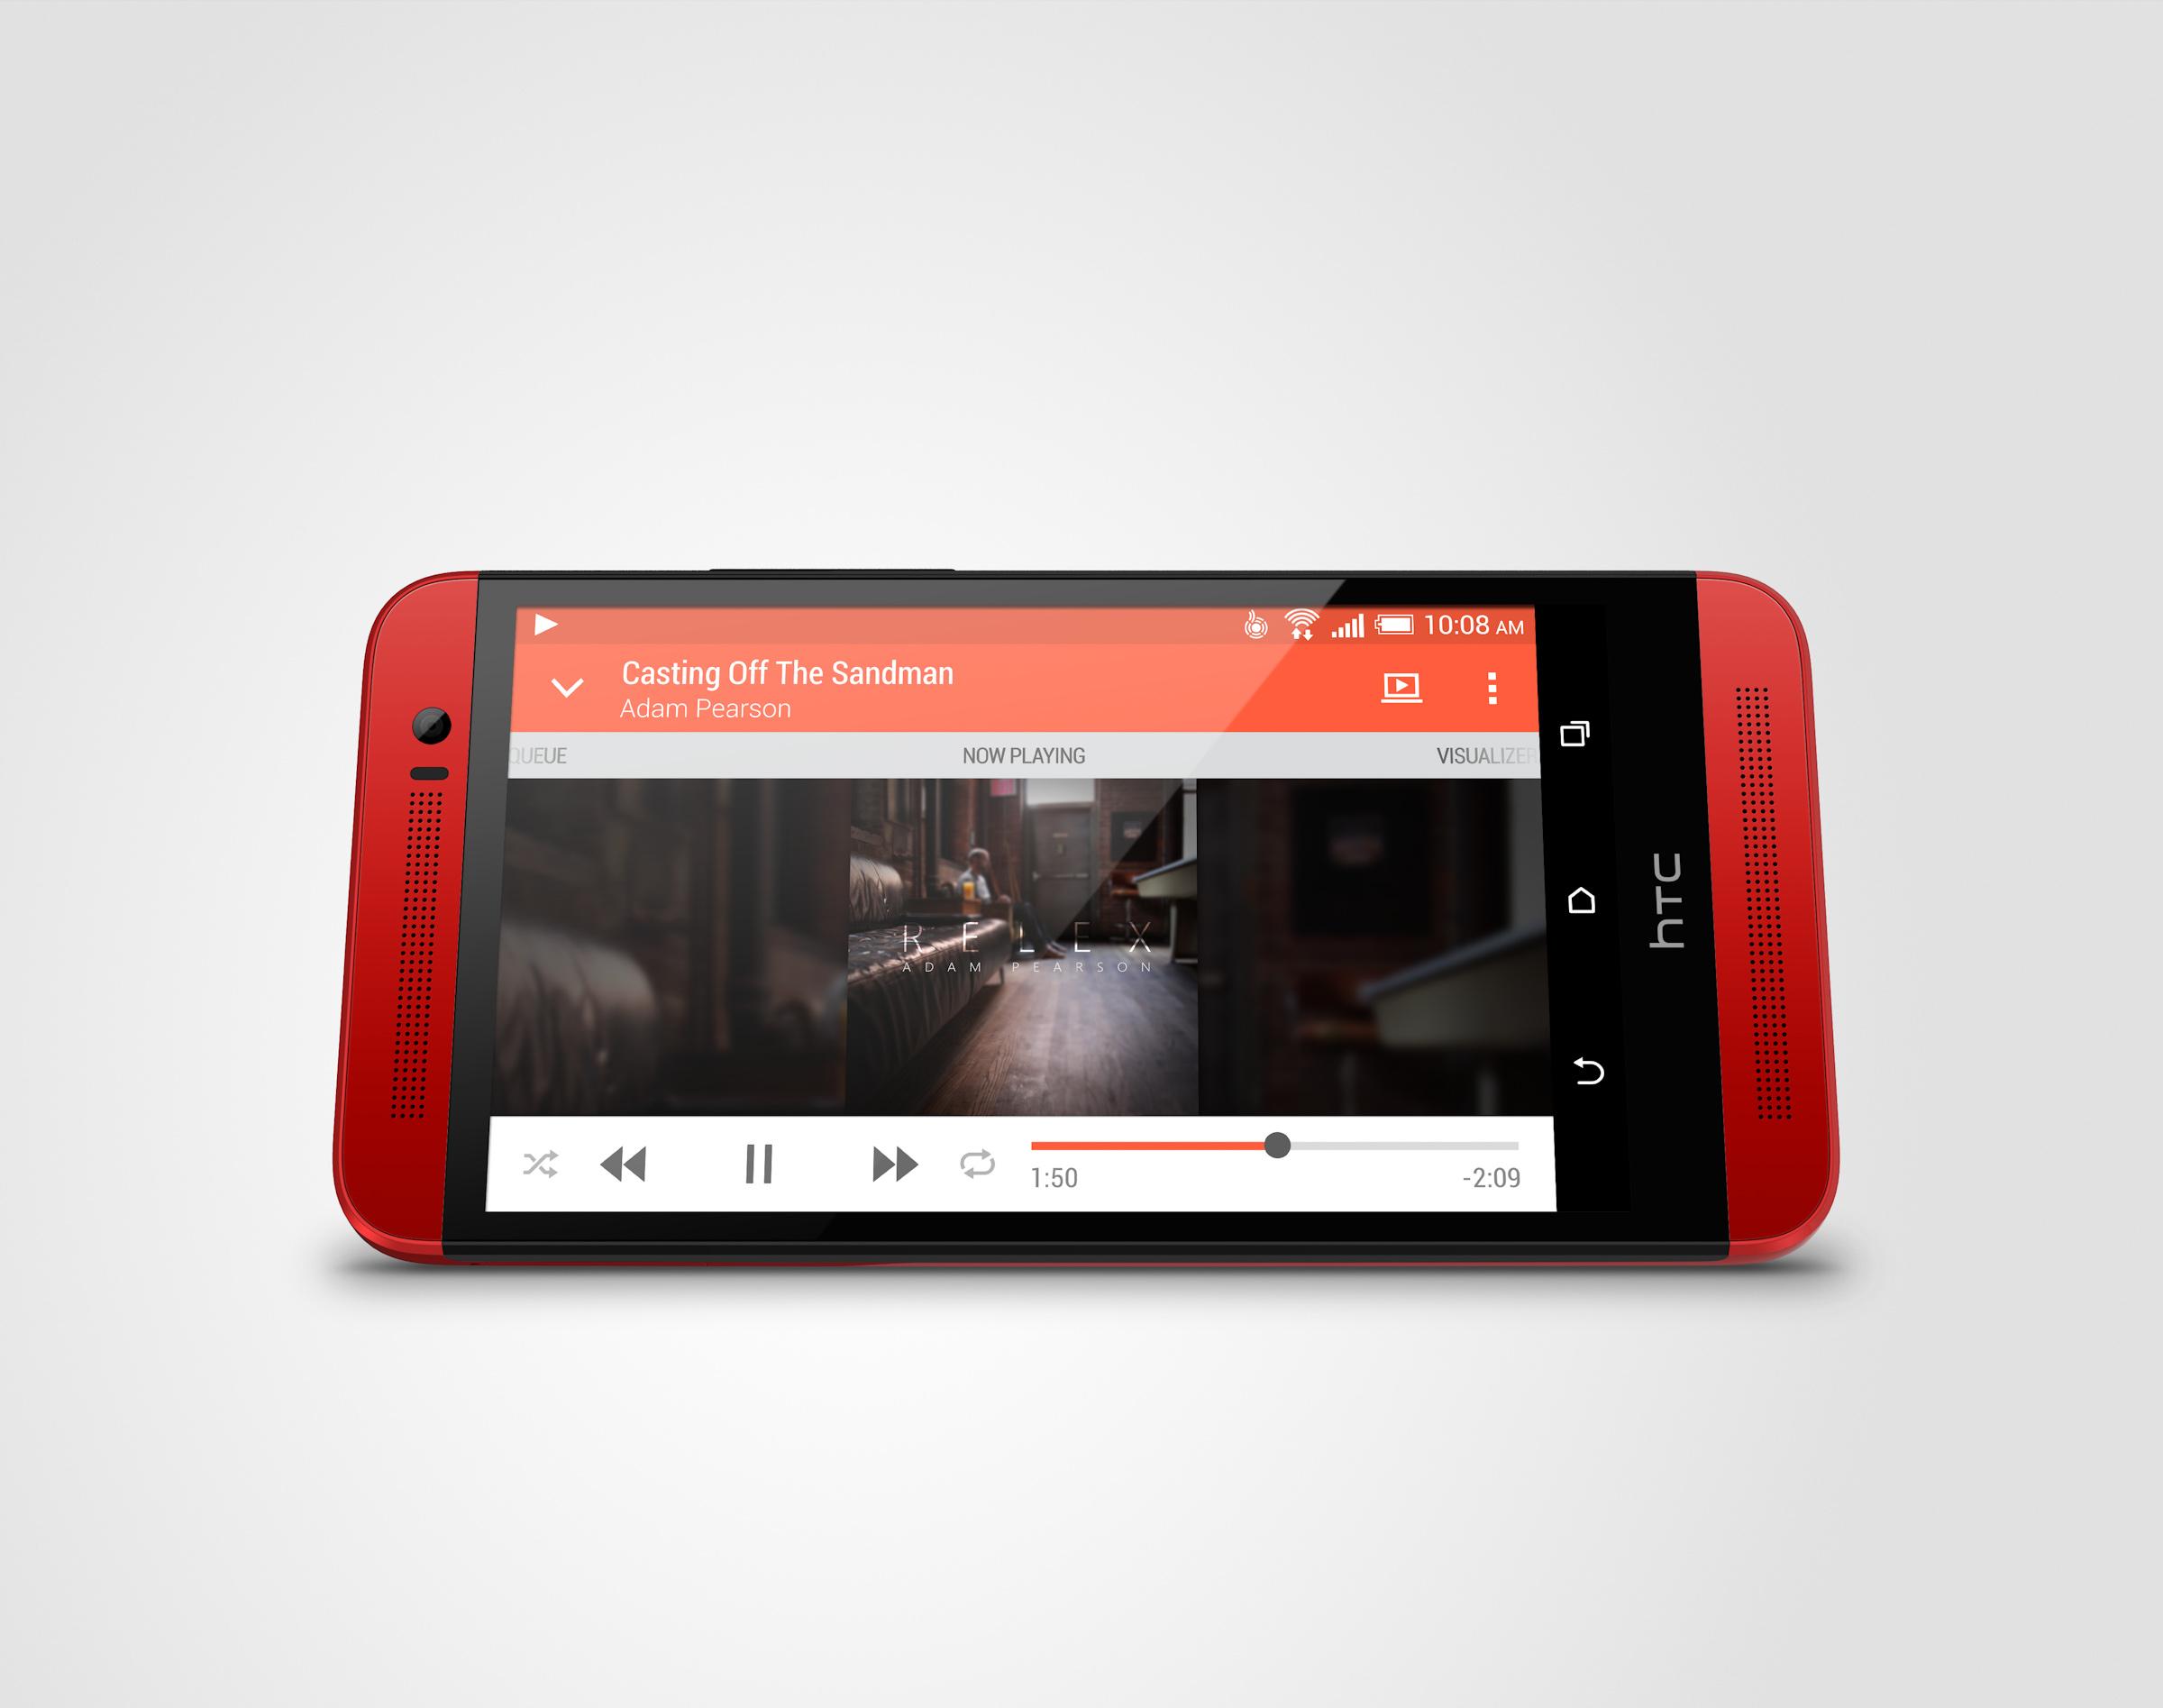 HTC One M8 Ace Press Shots -8